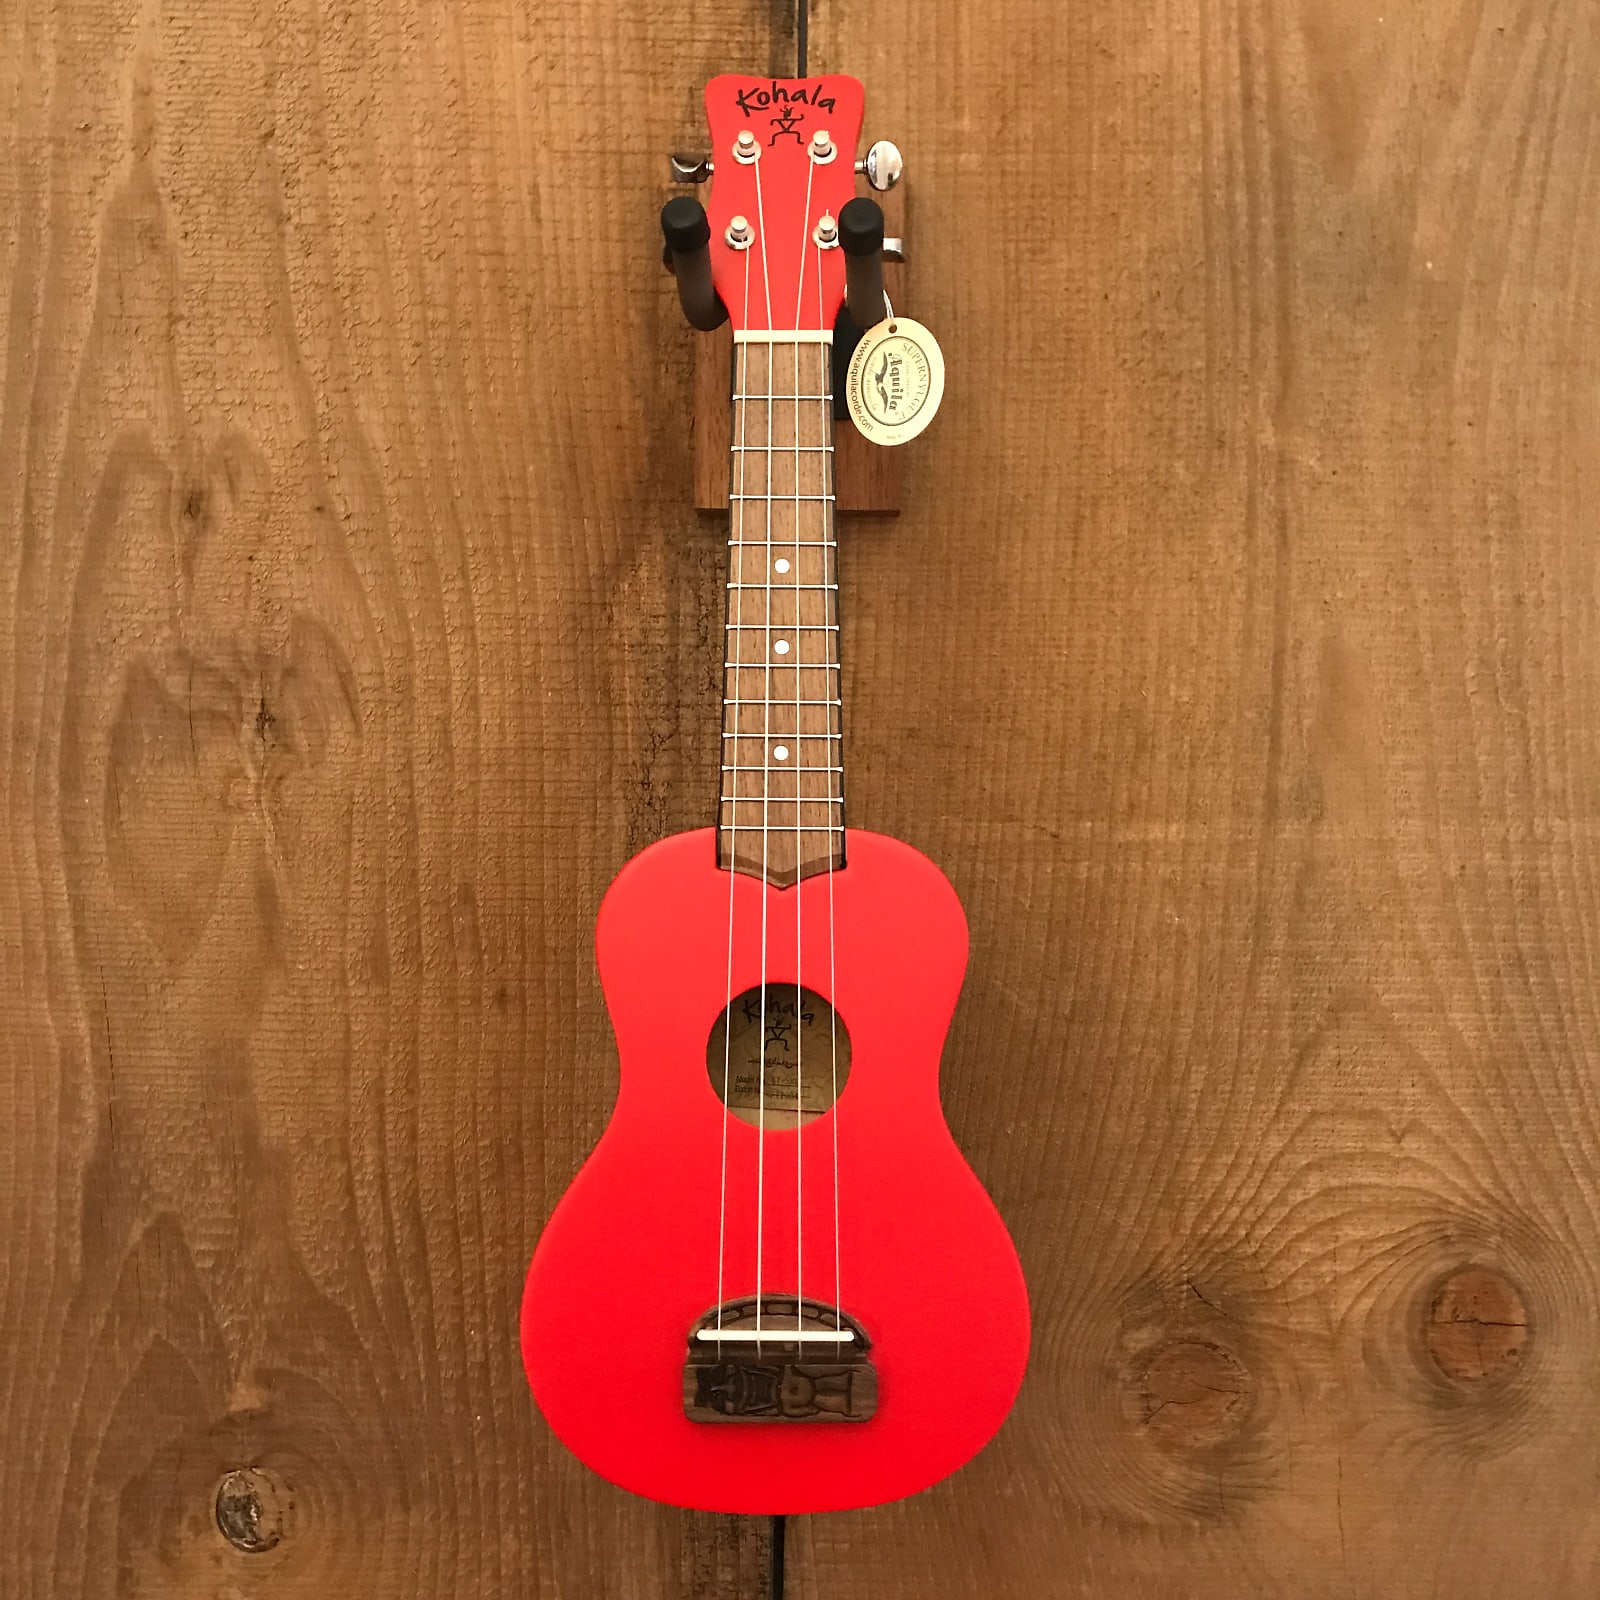 Kohala KT-SRD Tiki Series Soprano Ukulele Red